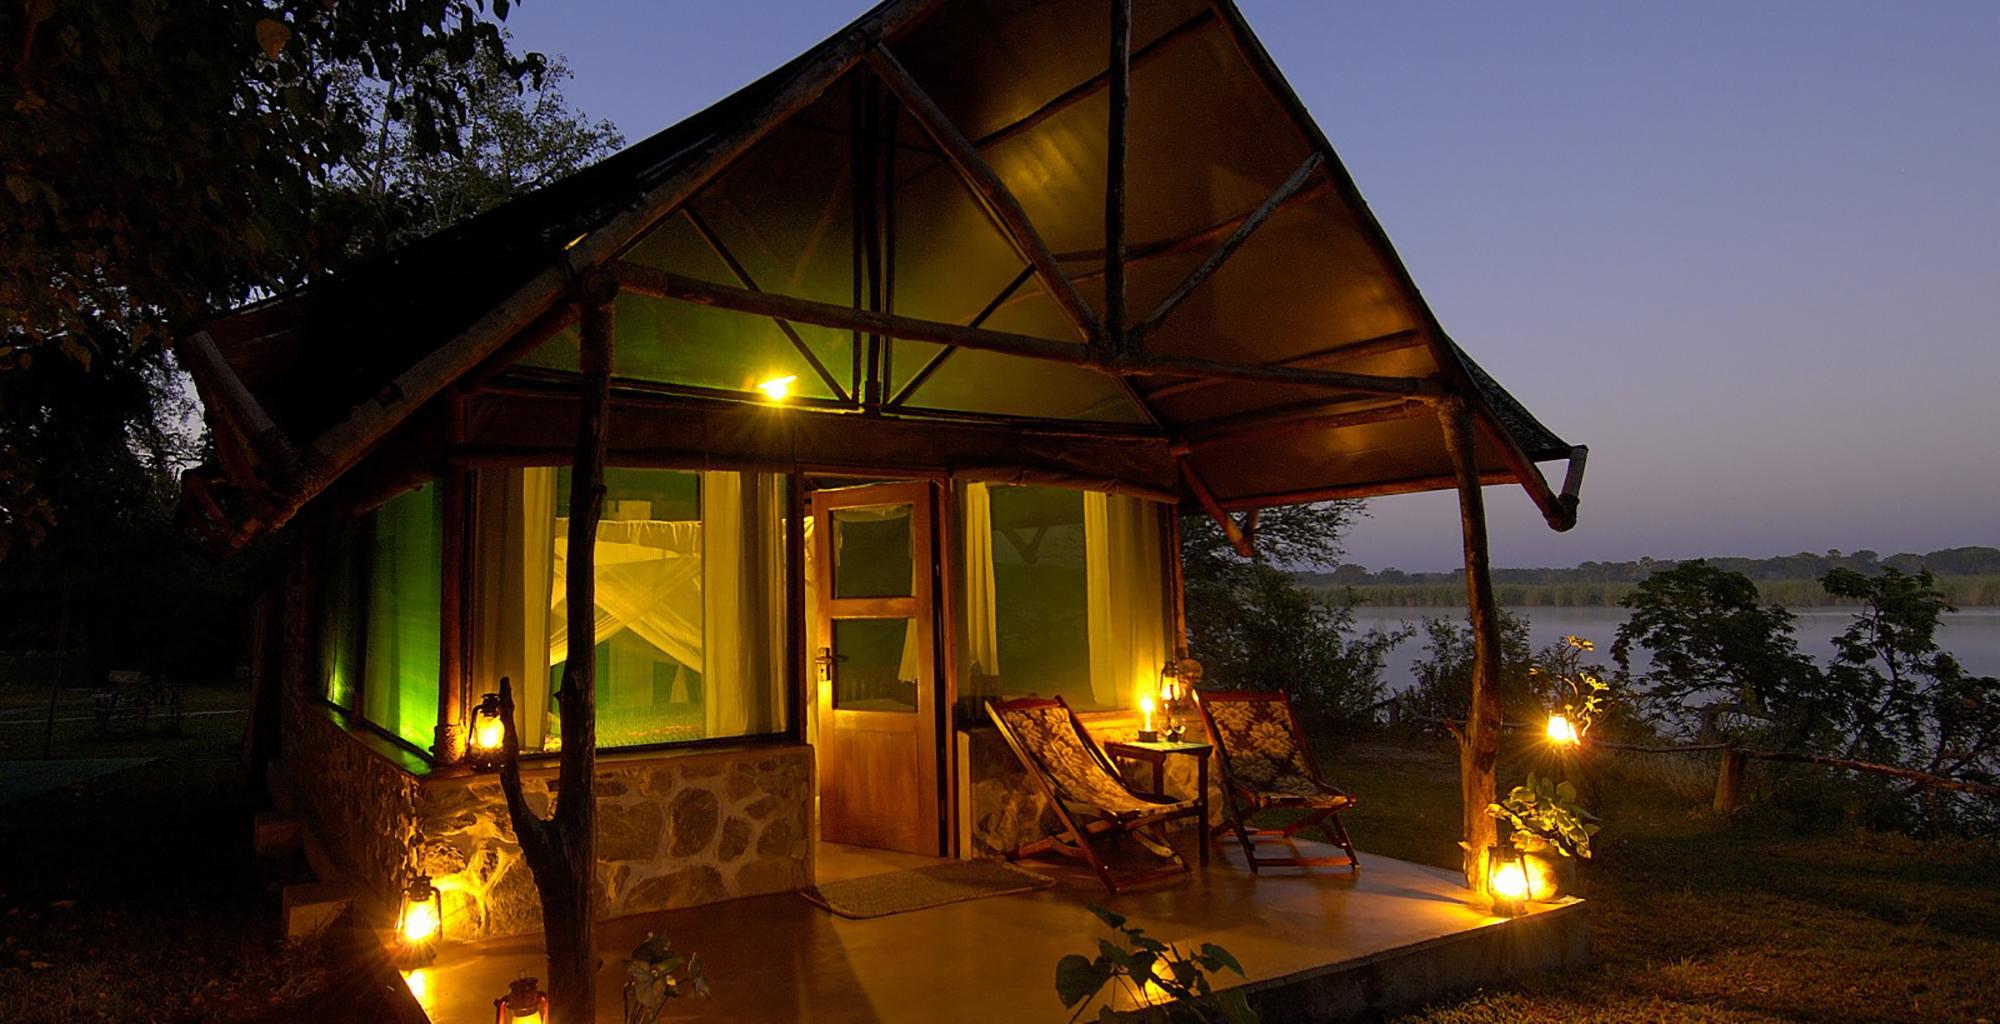 Malawi-Liwonde-National-Park-Mvuu-Lodge-Exterior